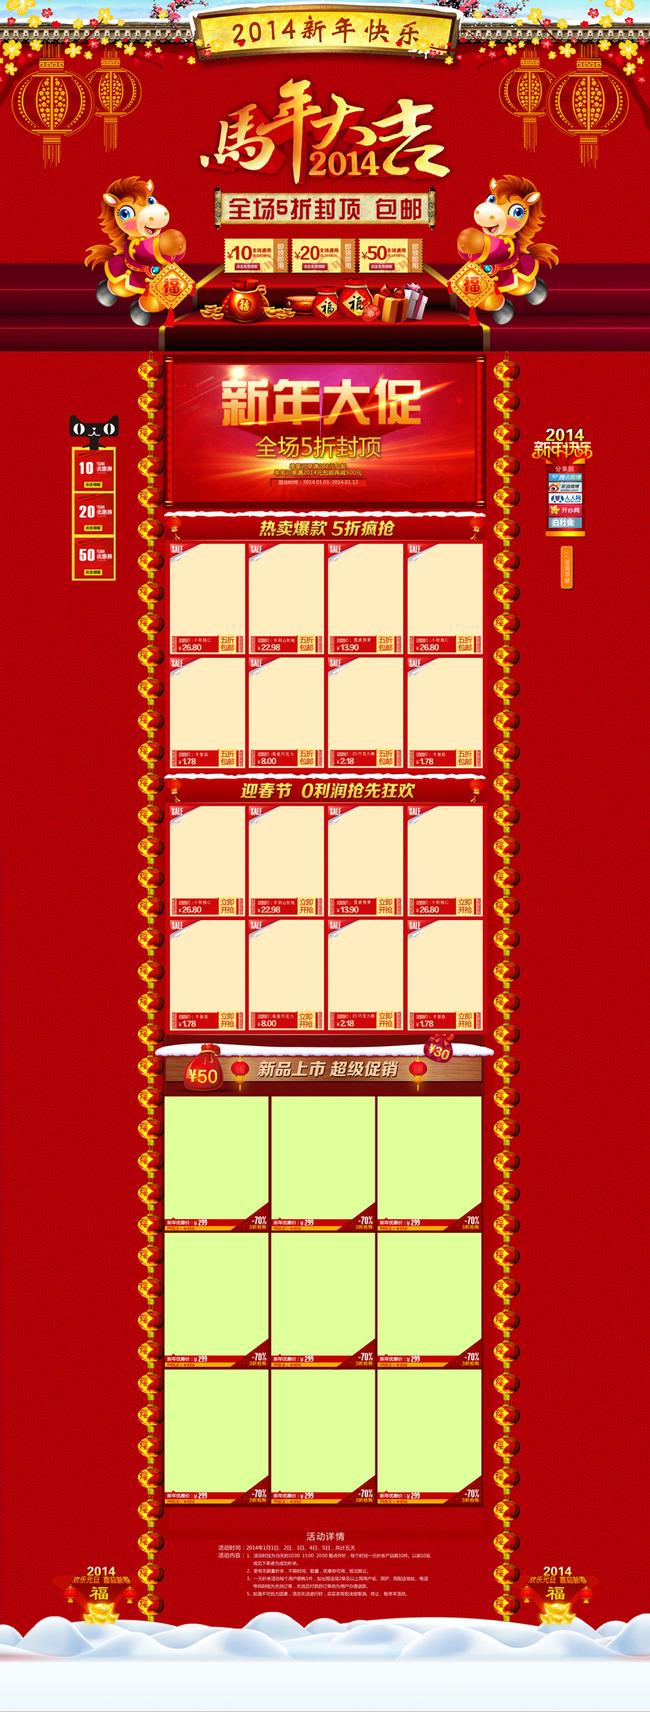 【psd】2014淘宝天猫新年春节店铺首页装修模板图片